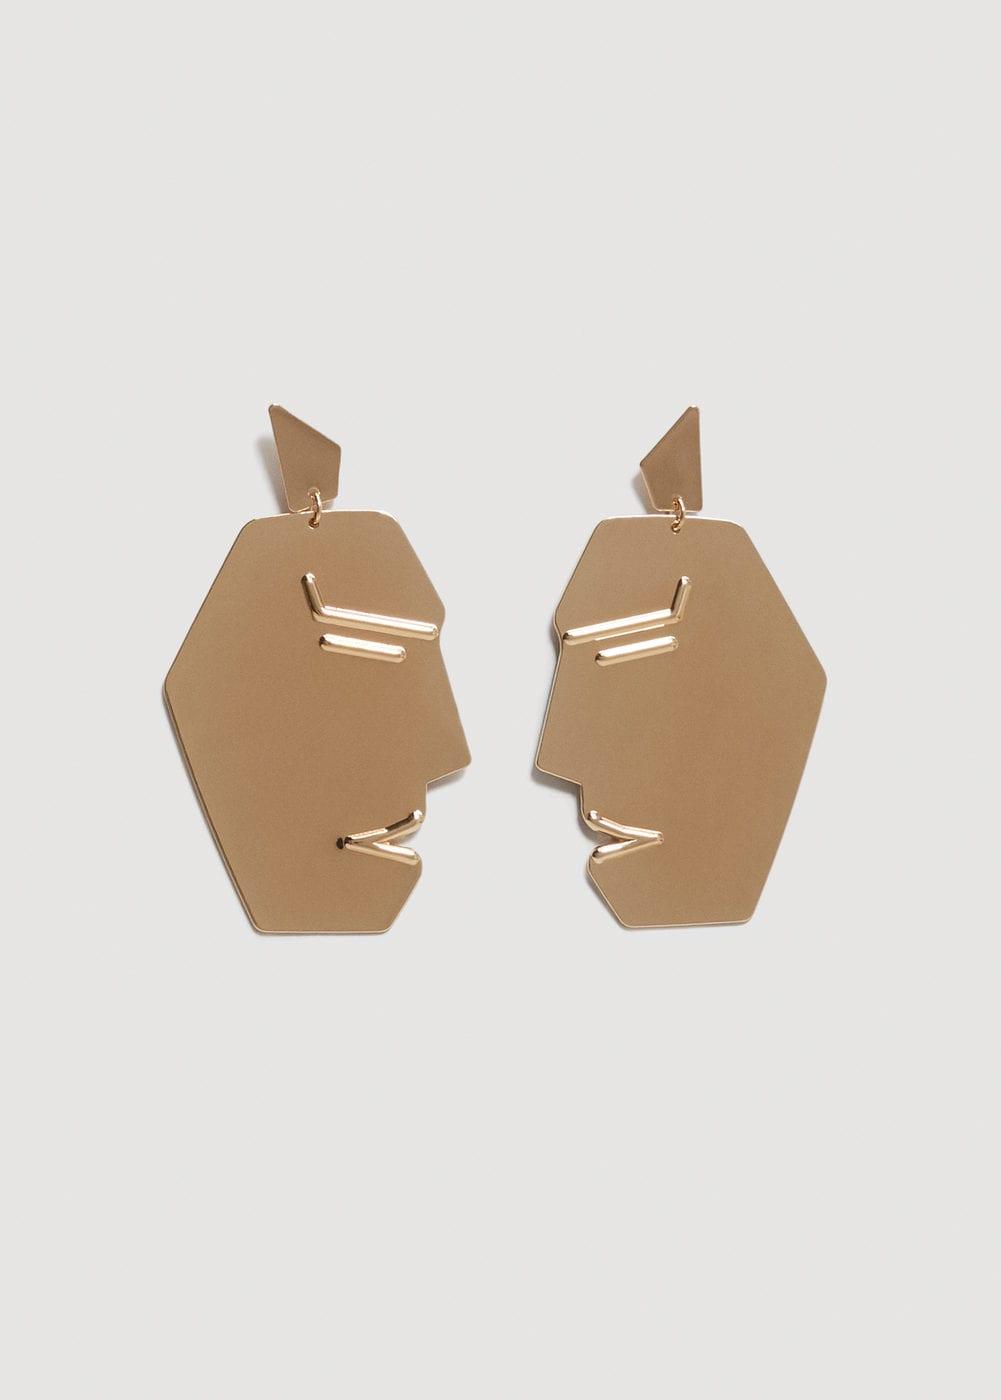 - FACE EARRINGS / Mango $20